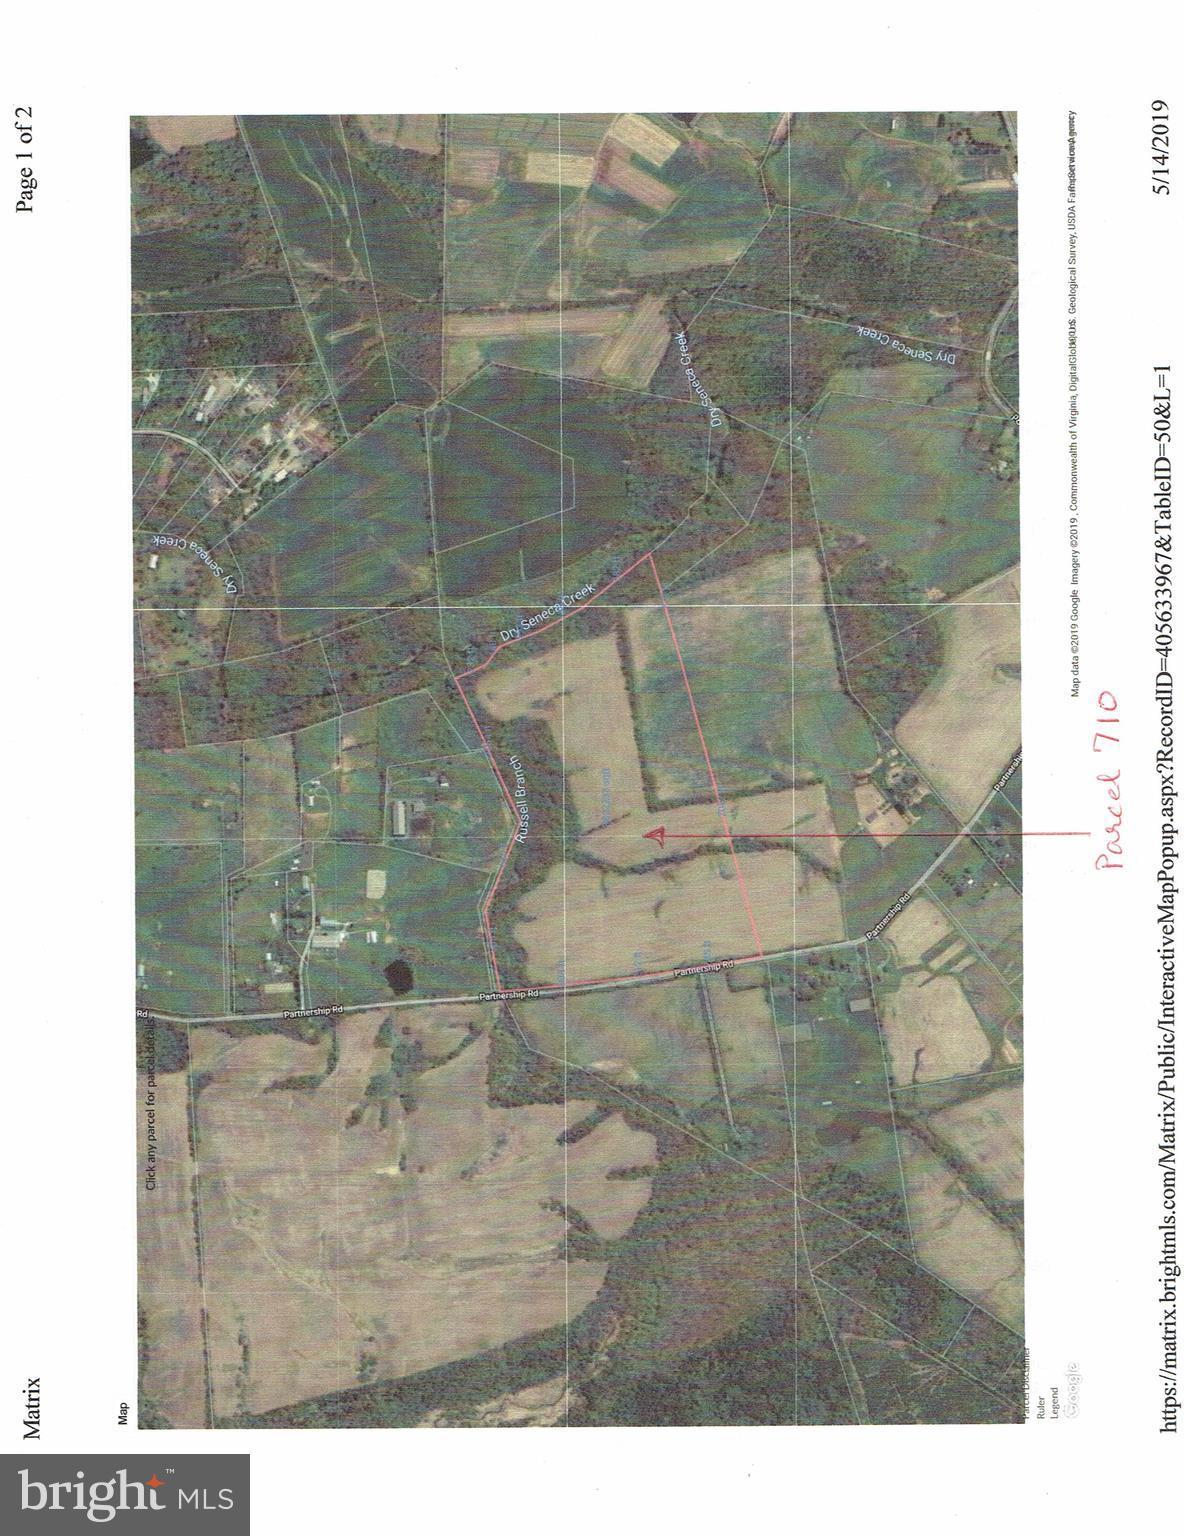 15501 PARTNERSHIP ROAD, POOLESVILLE, MD 20837